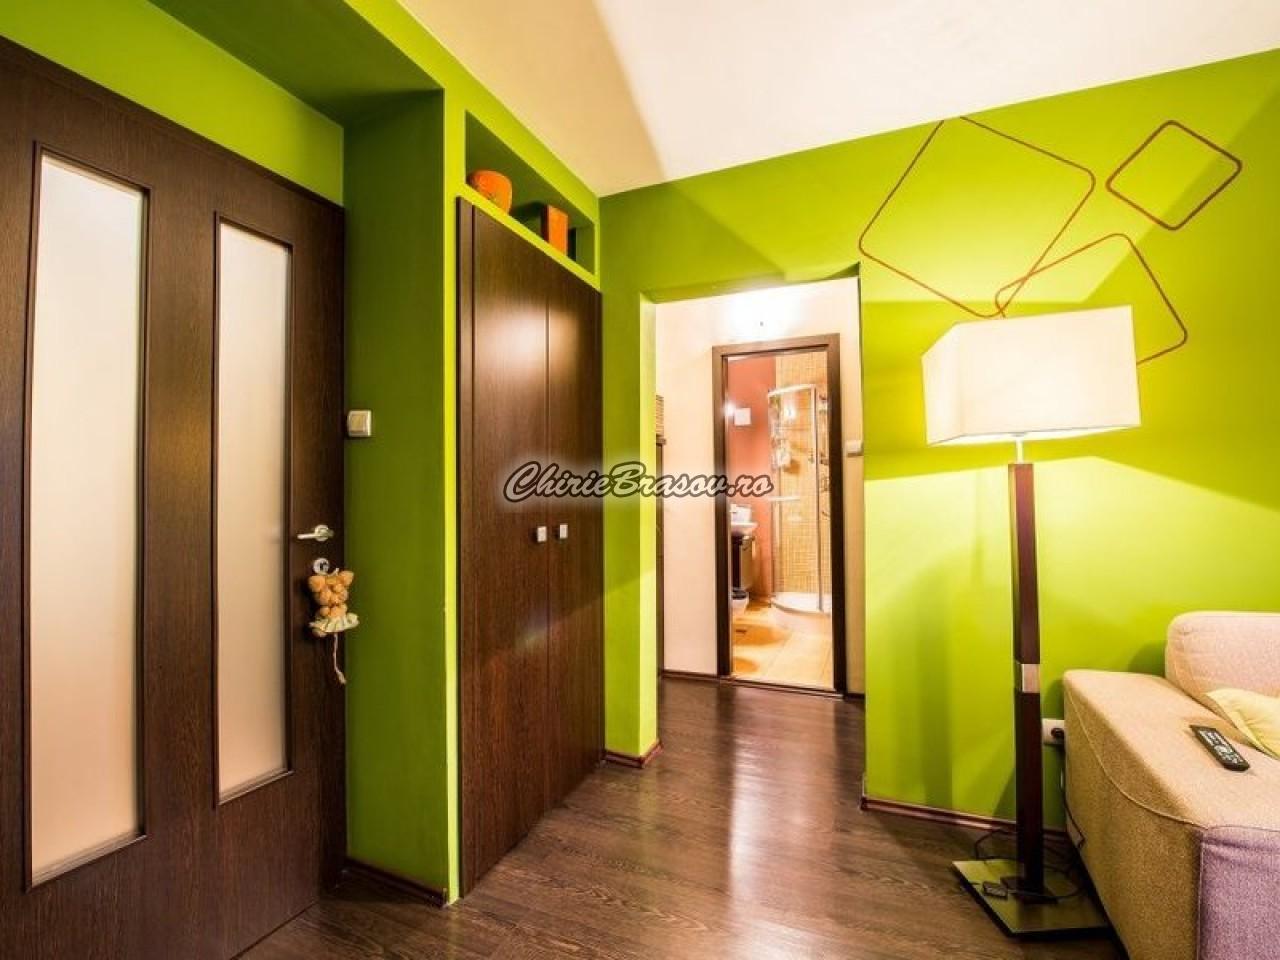 Inchiriere apartament 2 camere Brasov , Central - Grivitei-353-7